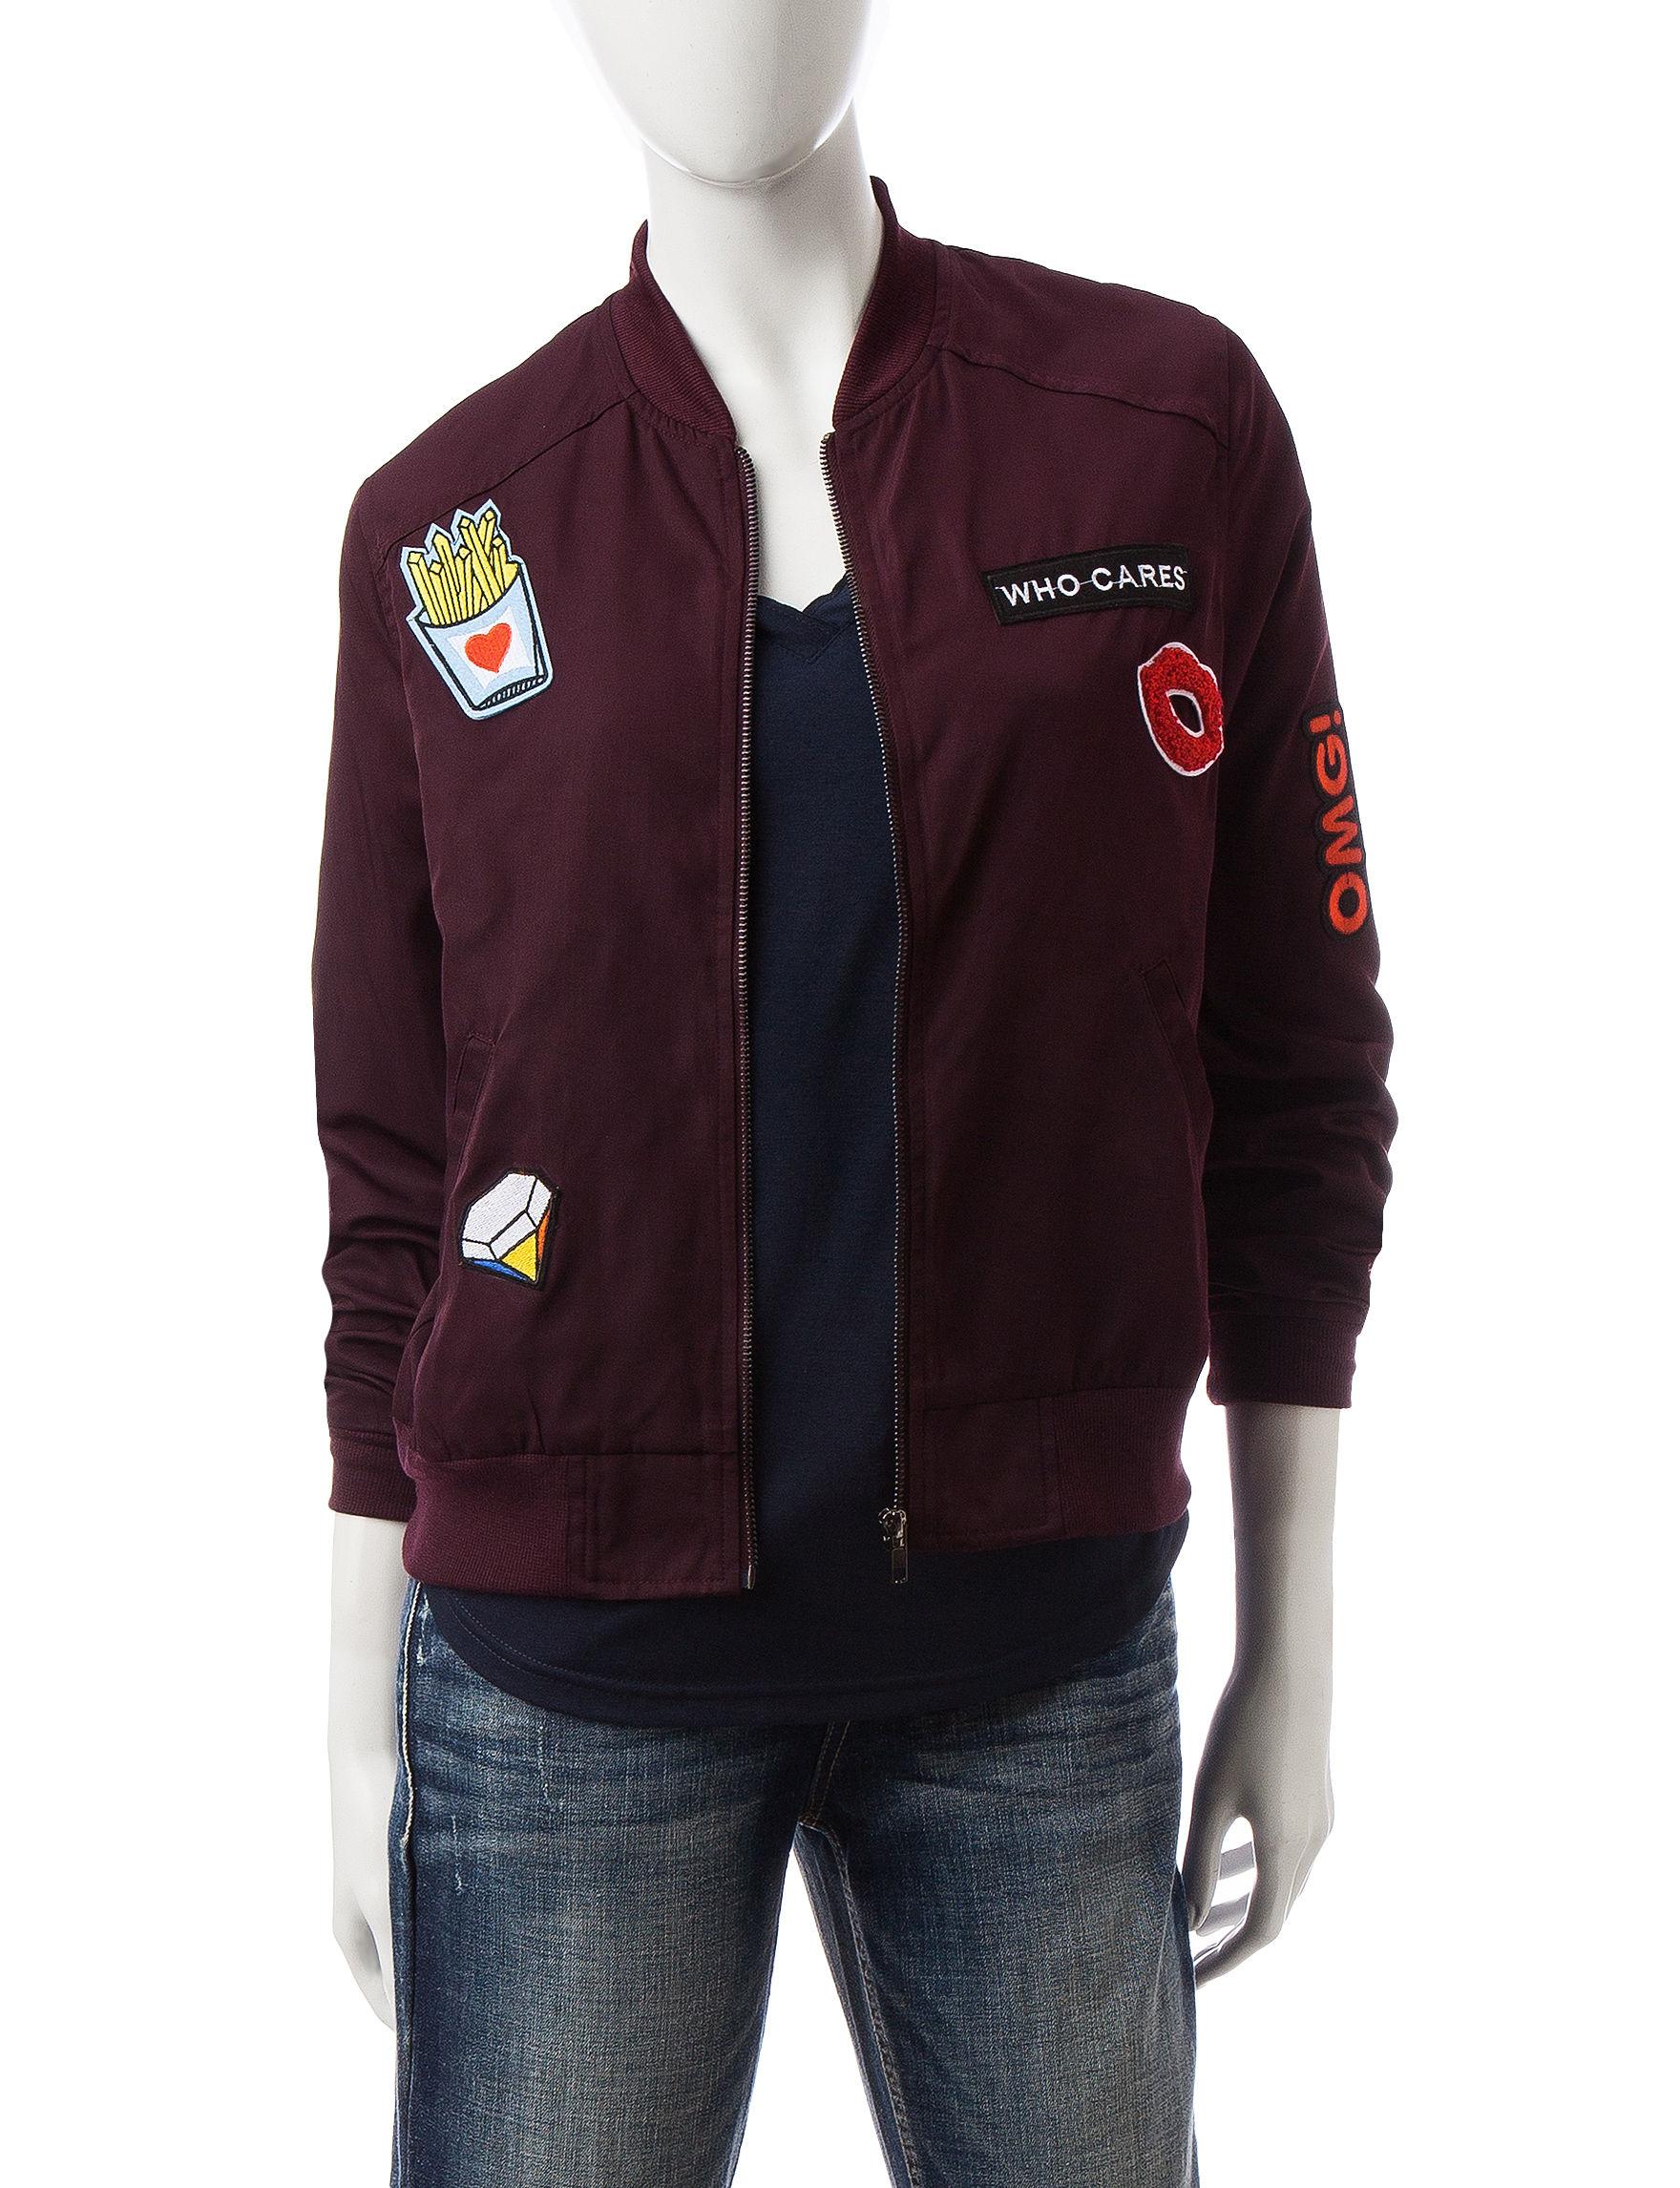 Justify Wine Lightweight Jackets & Blazers